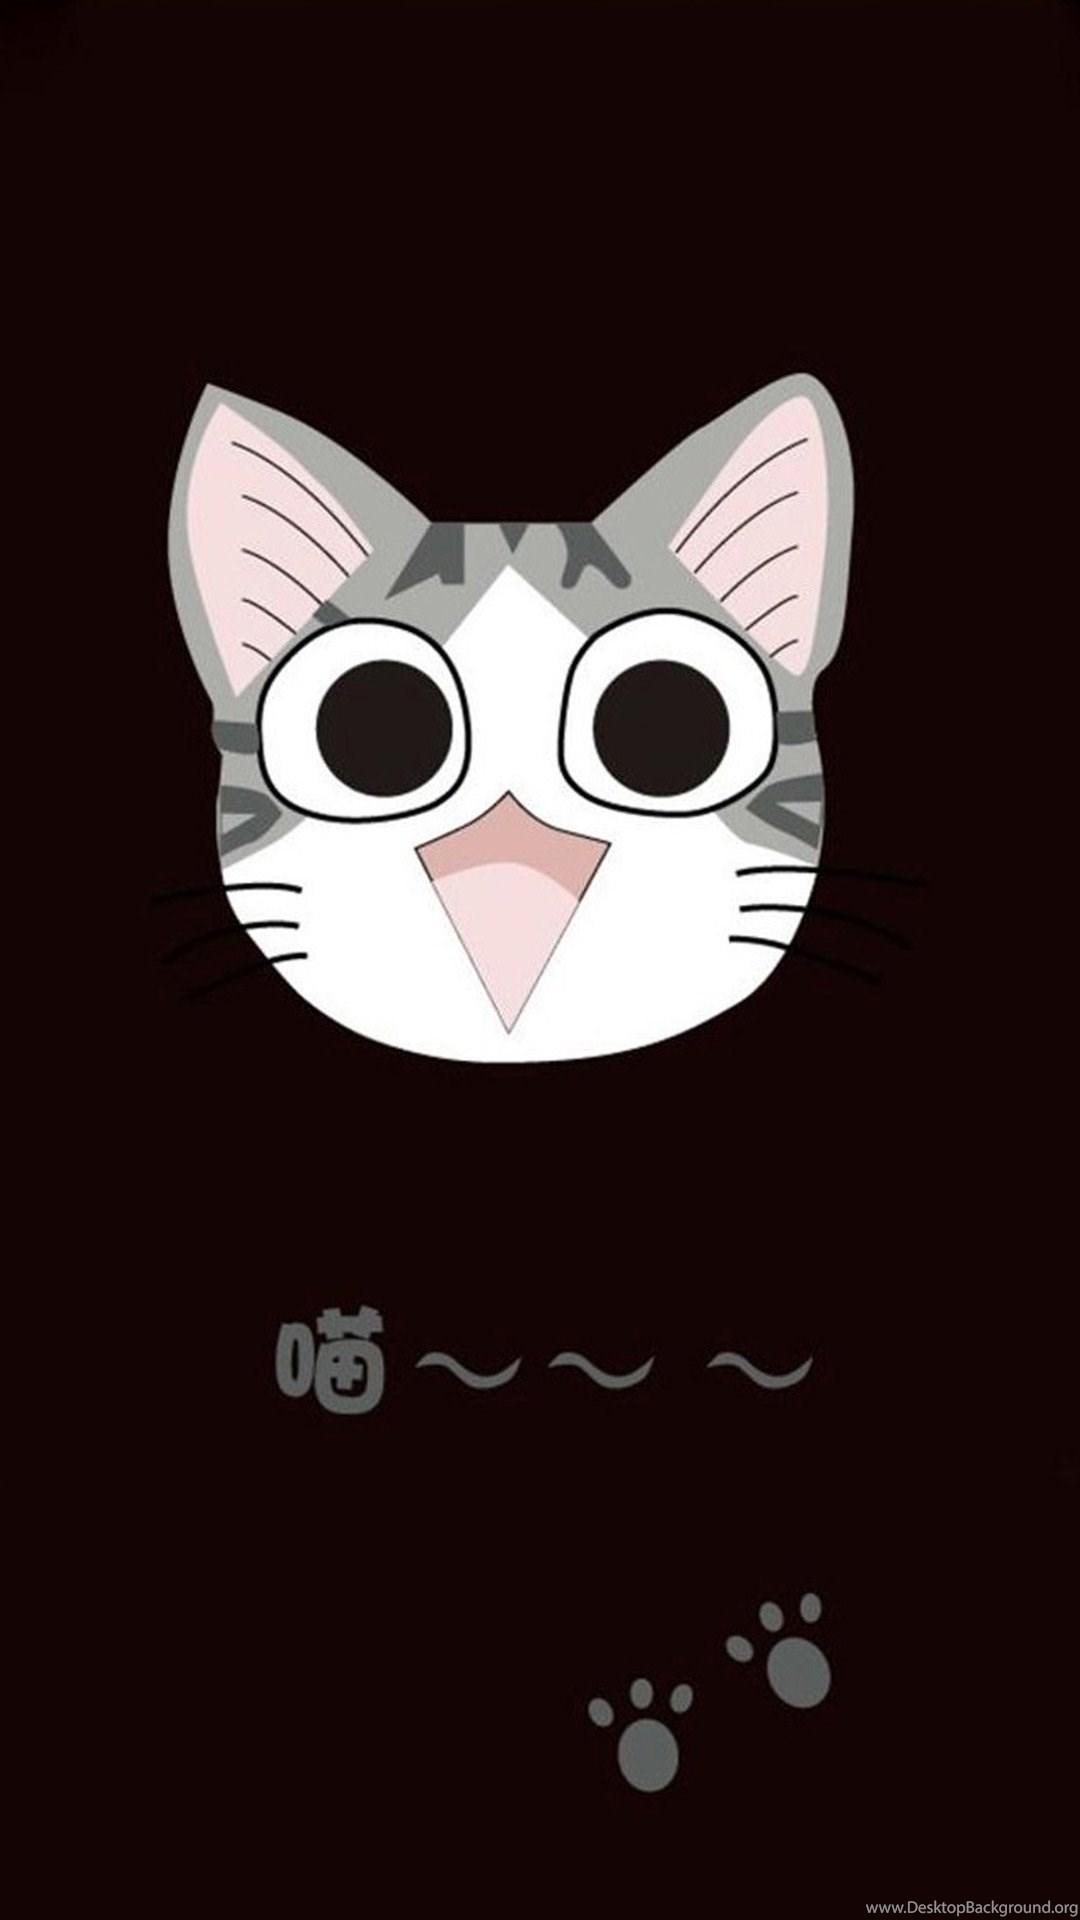 Cute Cat Cartoon 06 Galaxy S5 Wallpapers Jpg Desktop Background